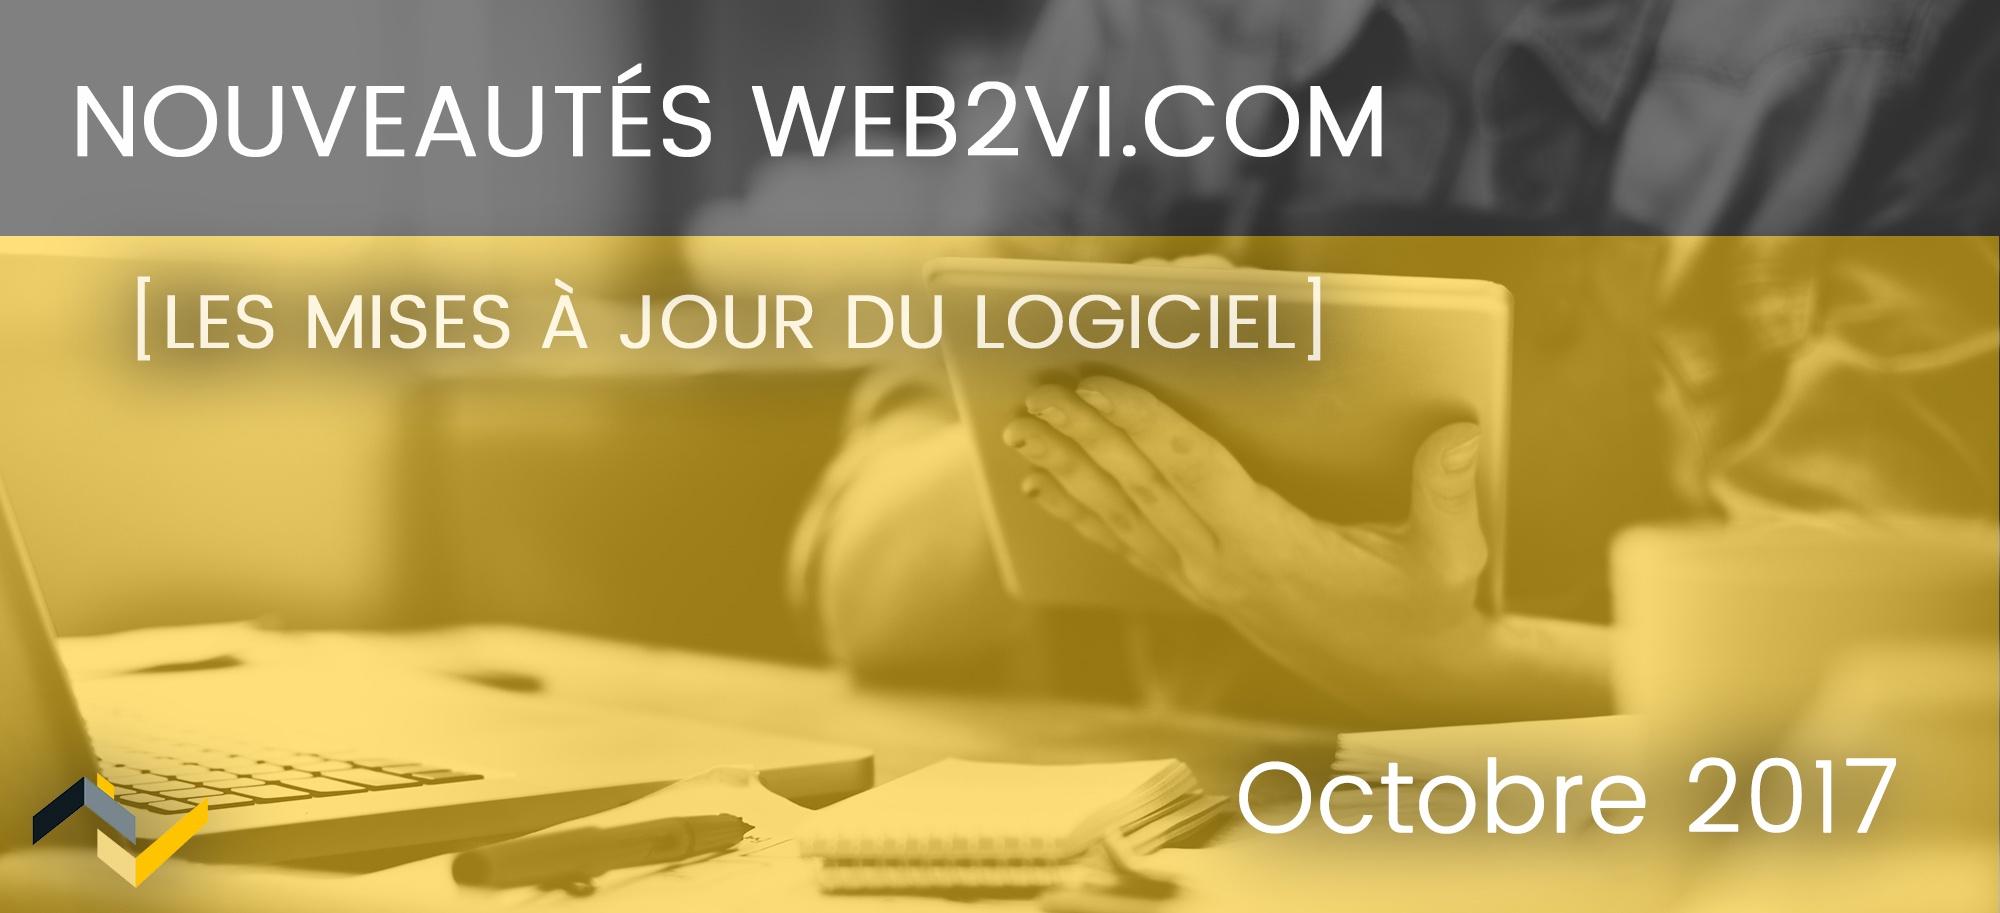 Les nouveautés de la plateforme Web2vi.com - Octobre 2017